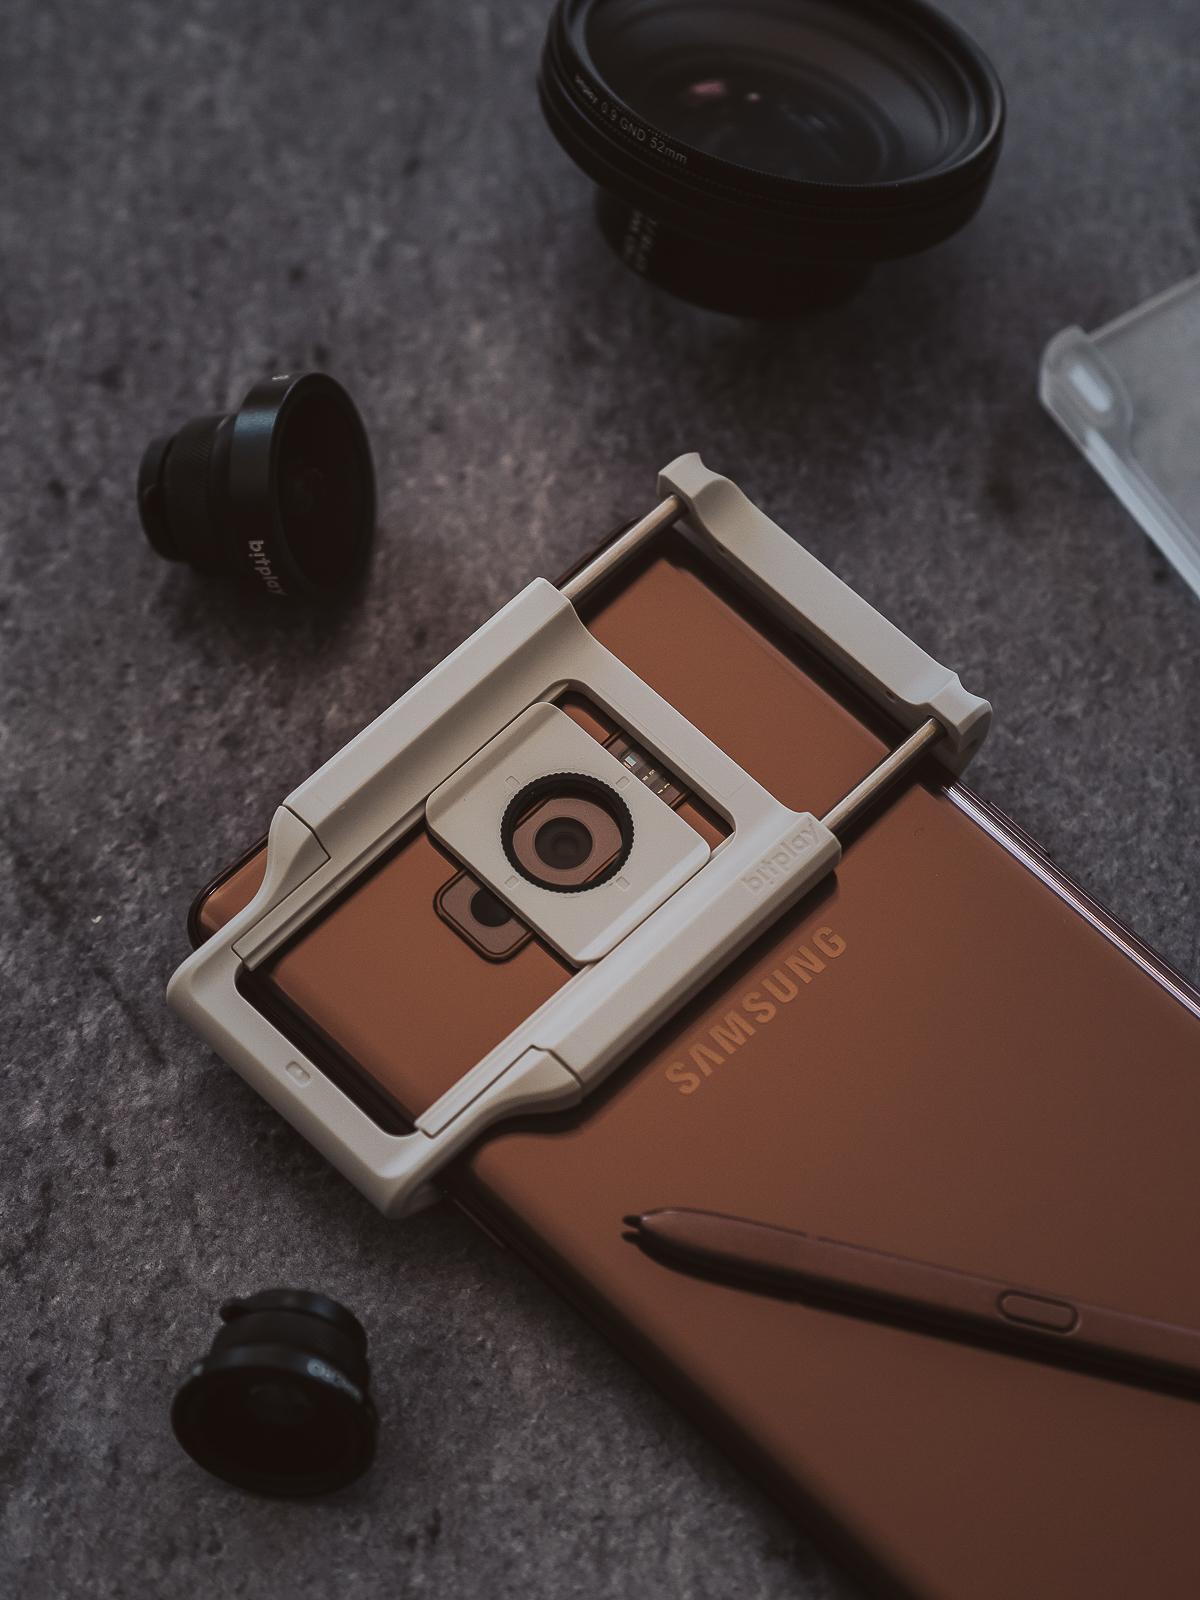 bitplay AllClip & iPhoneX + Samsung Galaxy Note9 - Olympus EM1Markii4518 - Yes! Please Enjoy-9.jpg